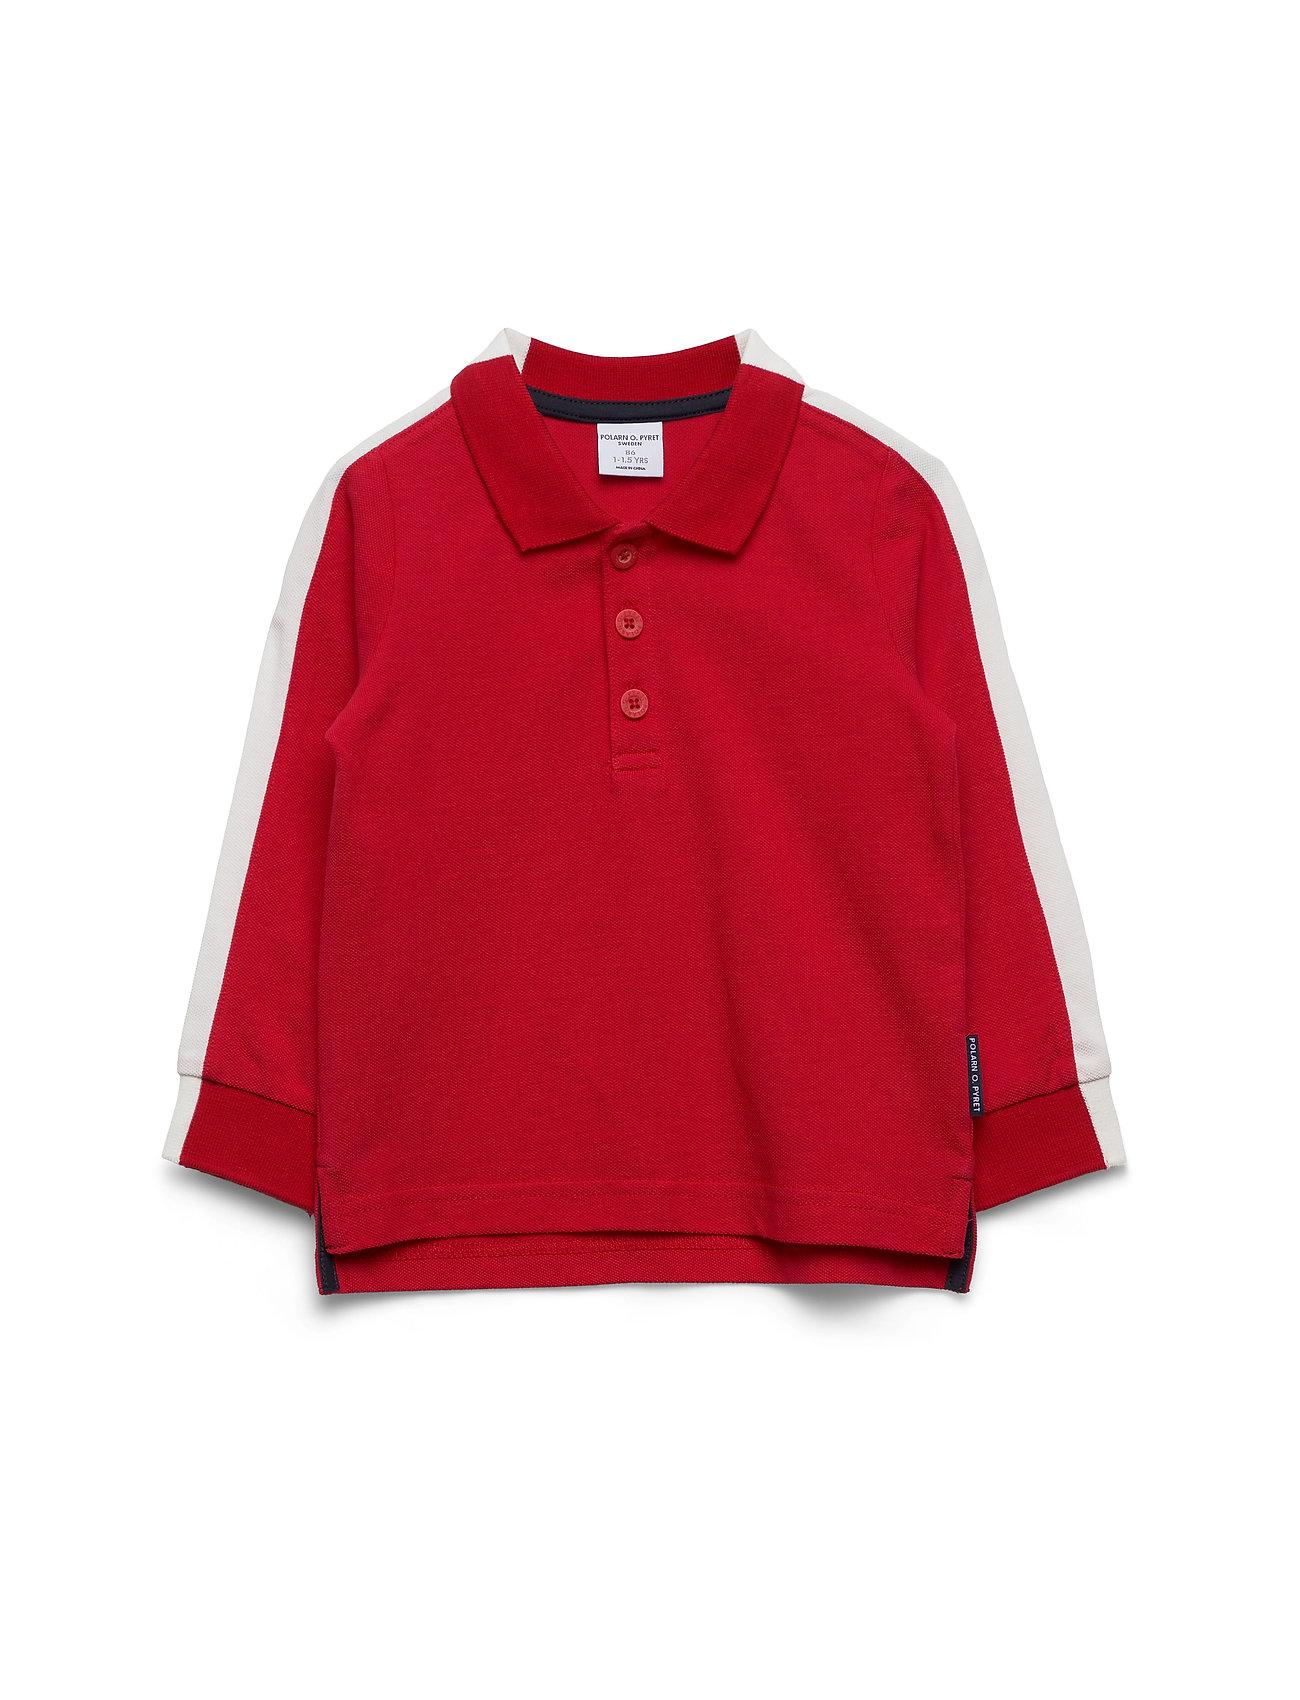 Polarn O. Pyret Top l/s Preschool - ROCOCCO RED